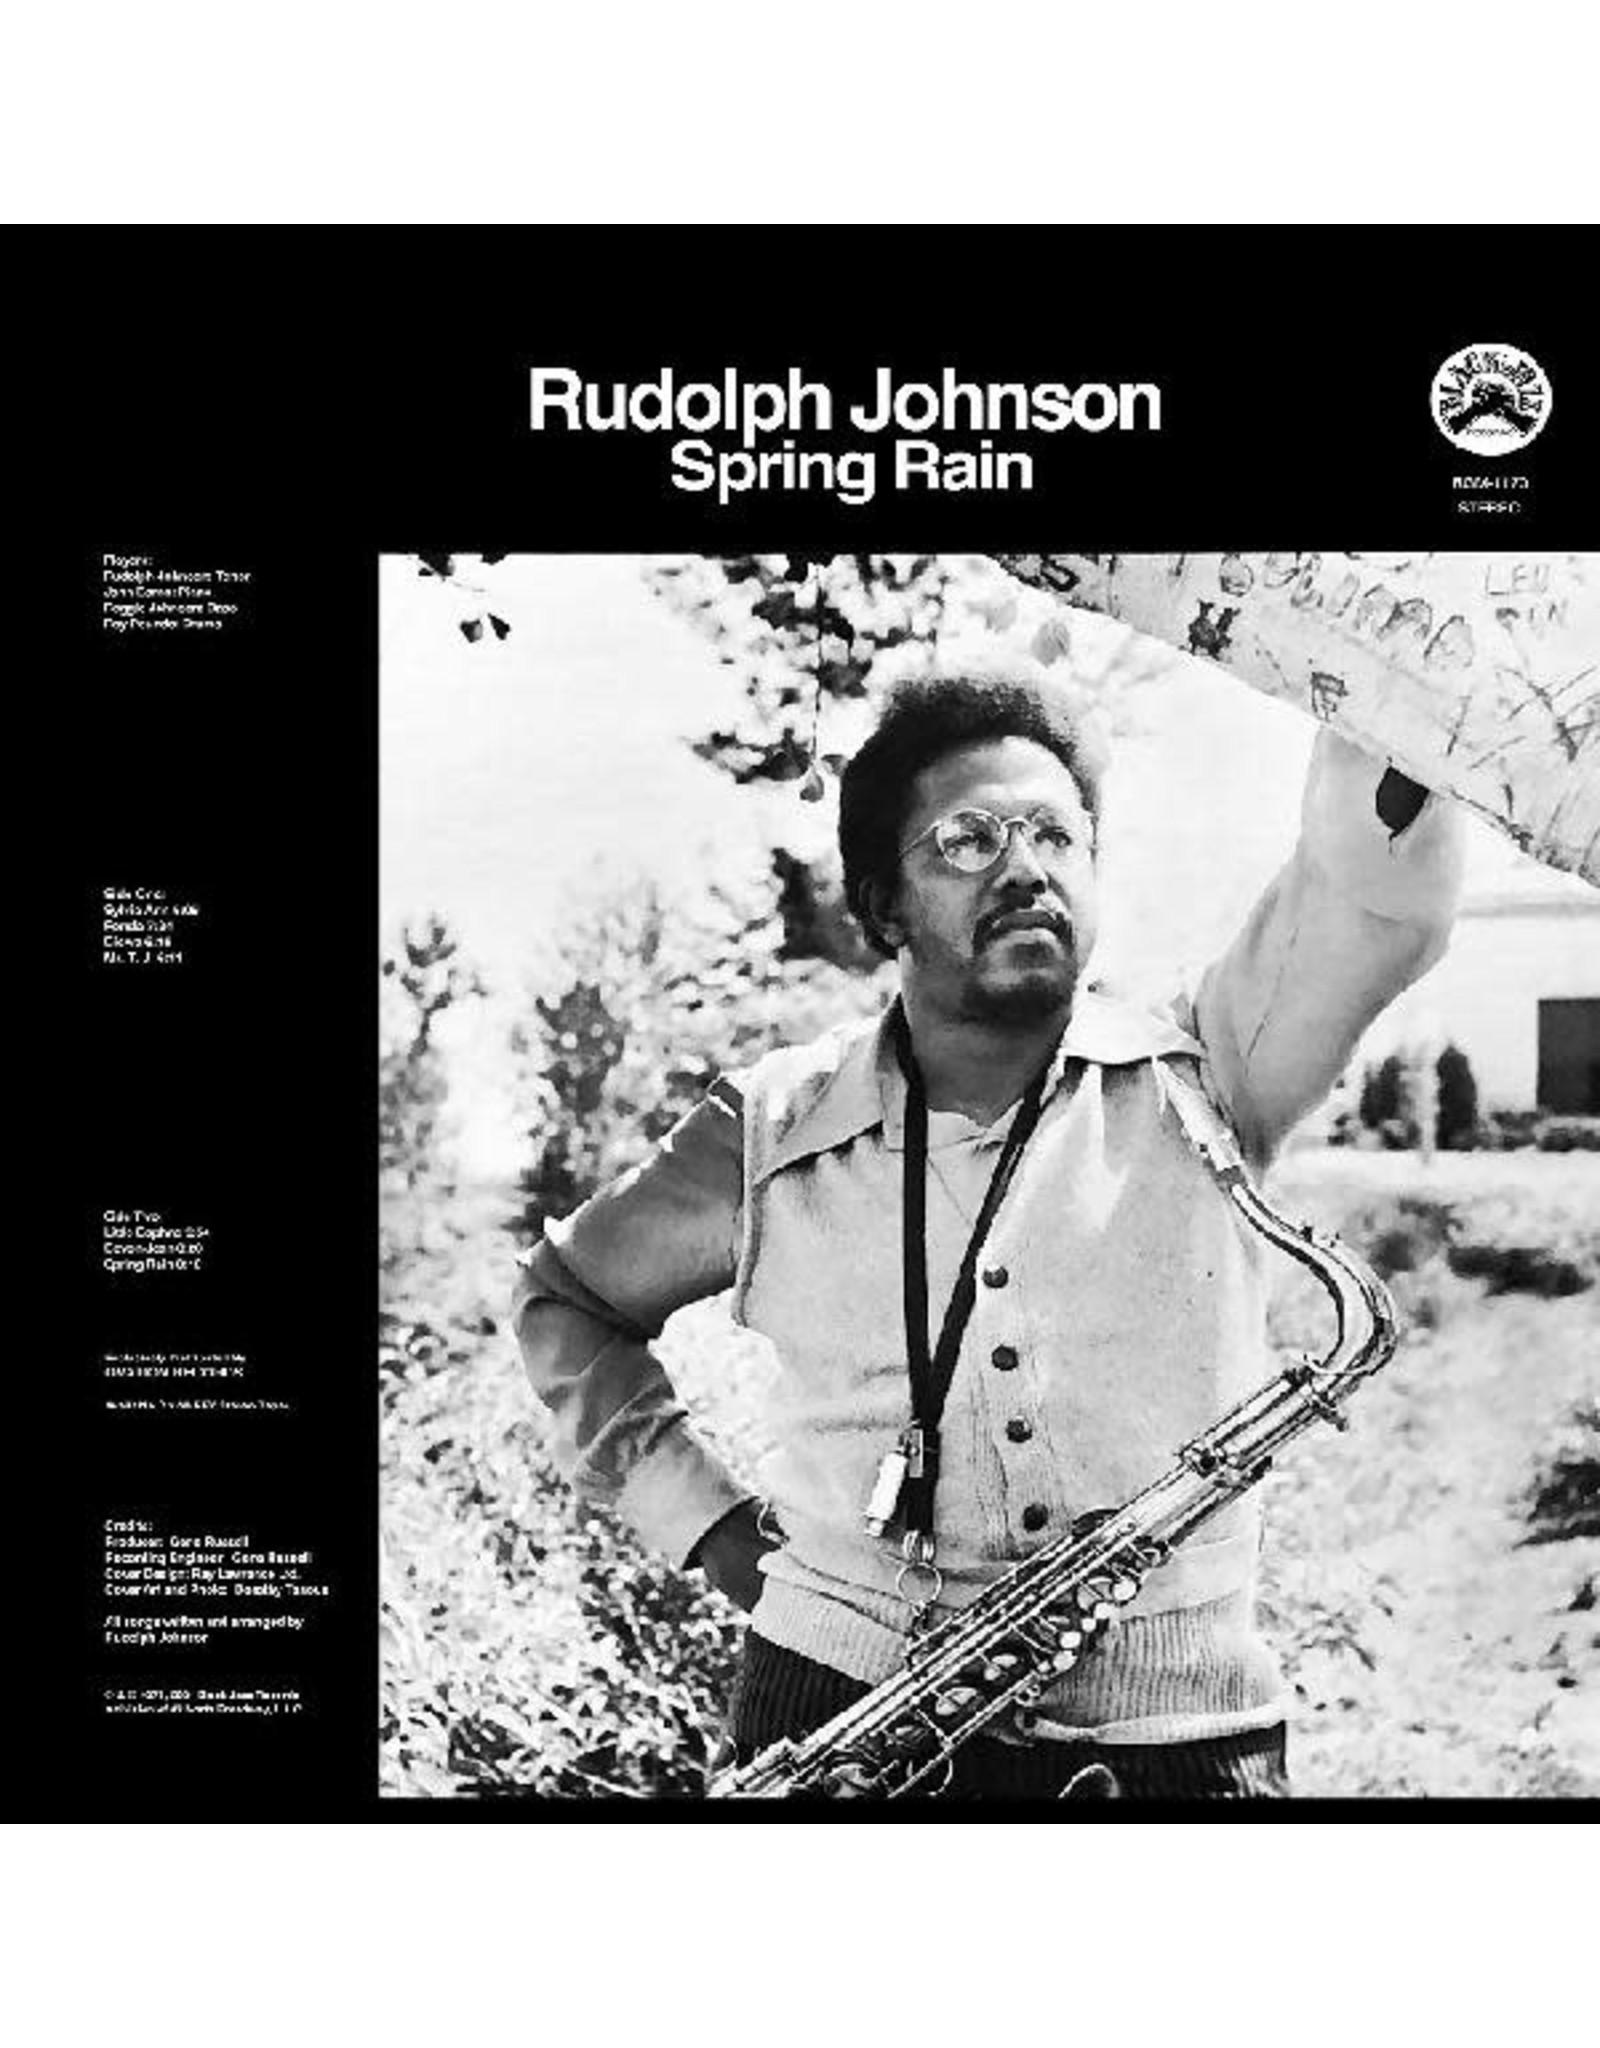 New Vinyl Rudolph Johnson - Spring Rain LP